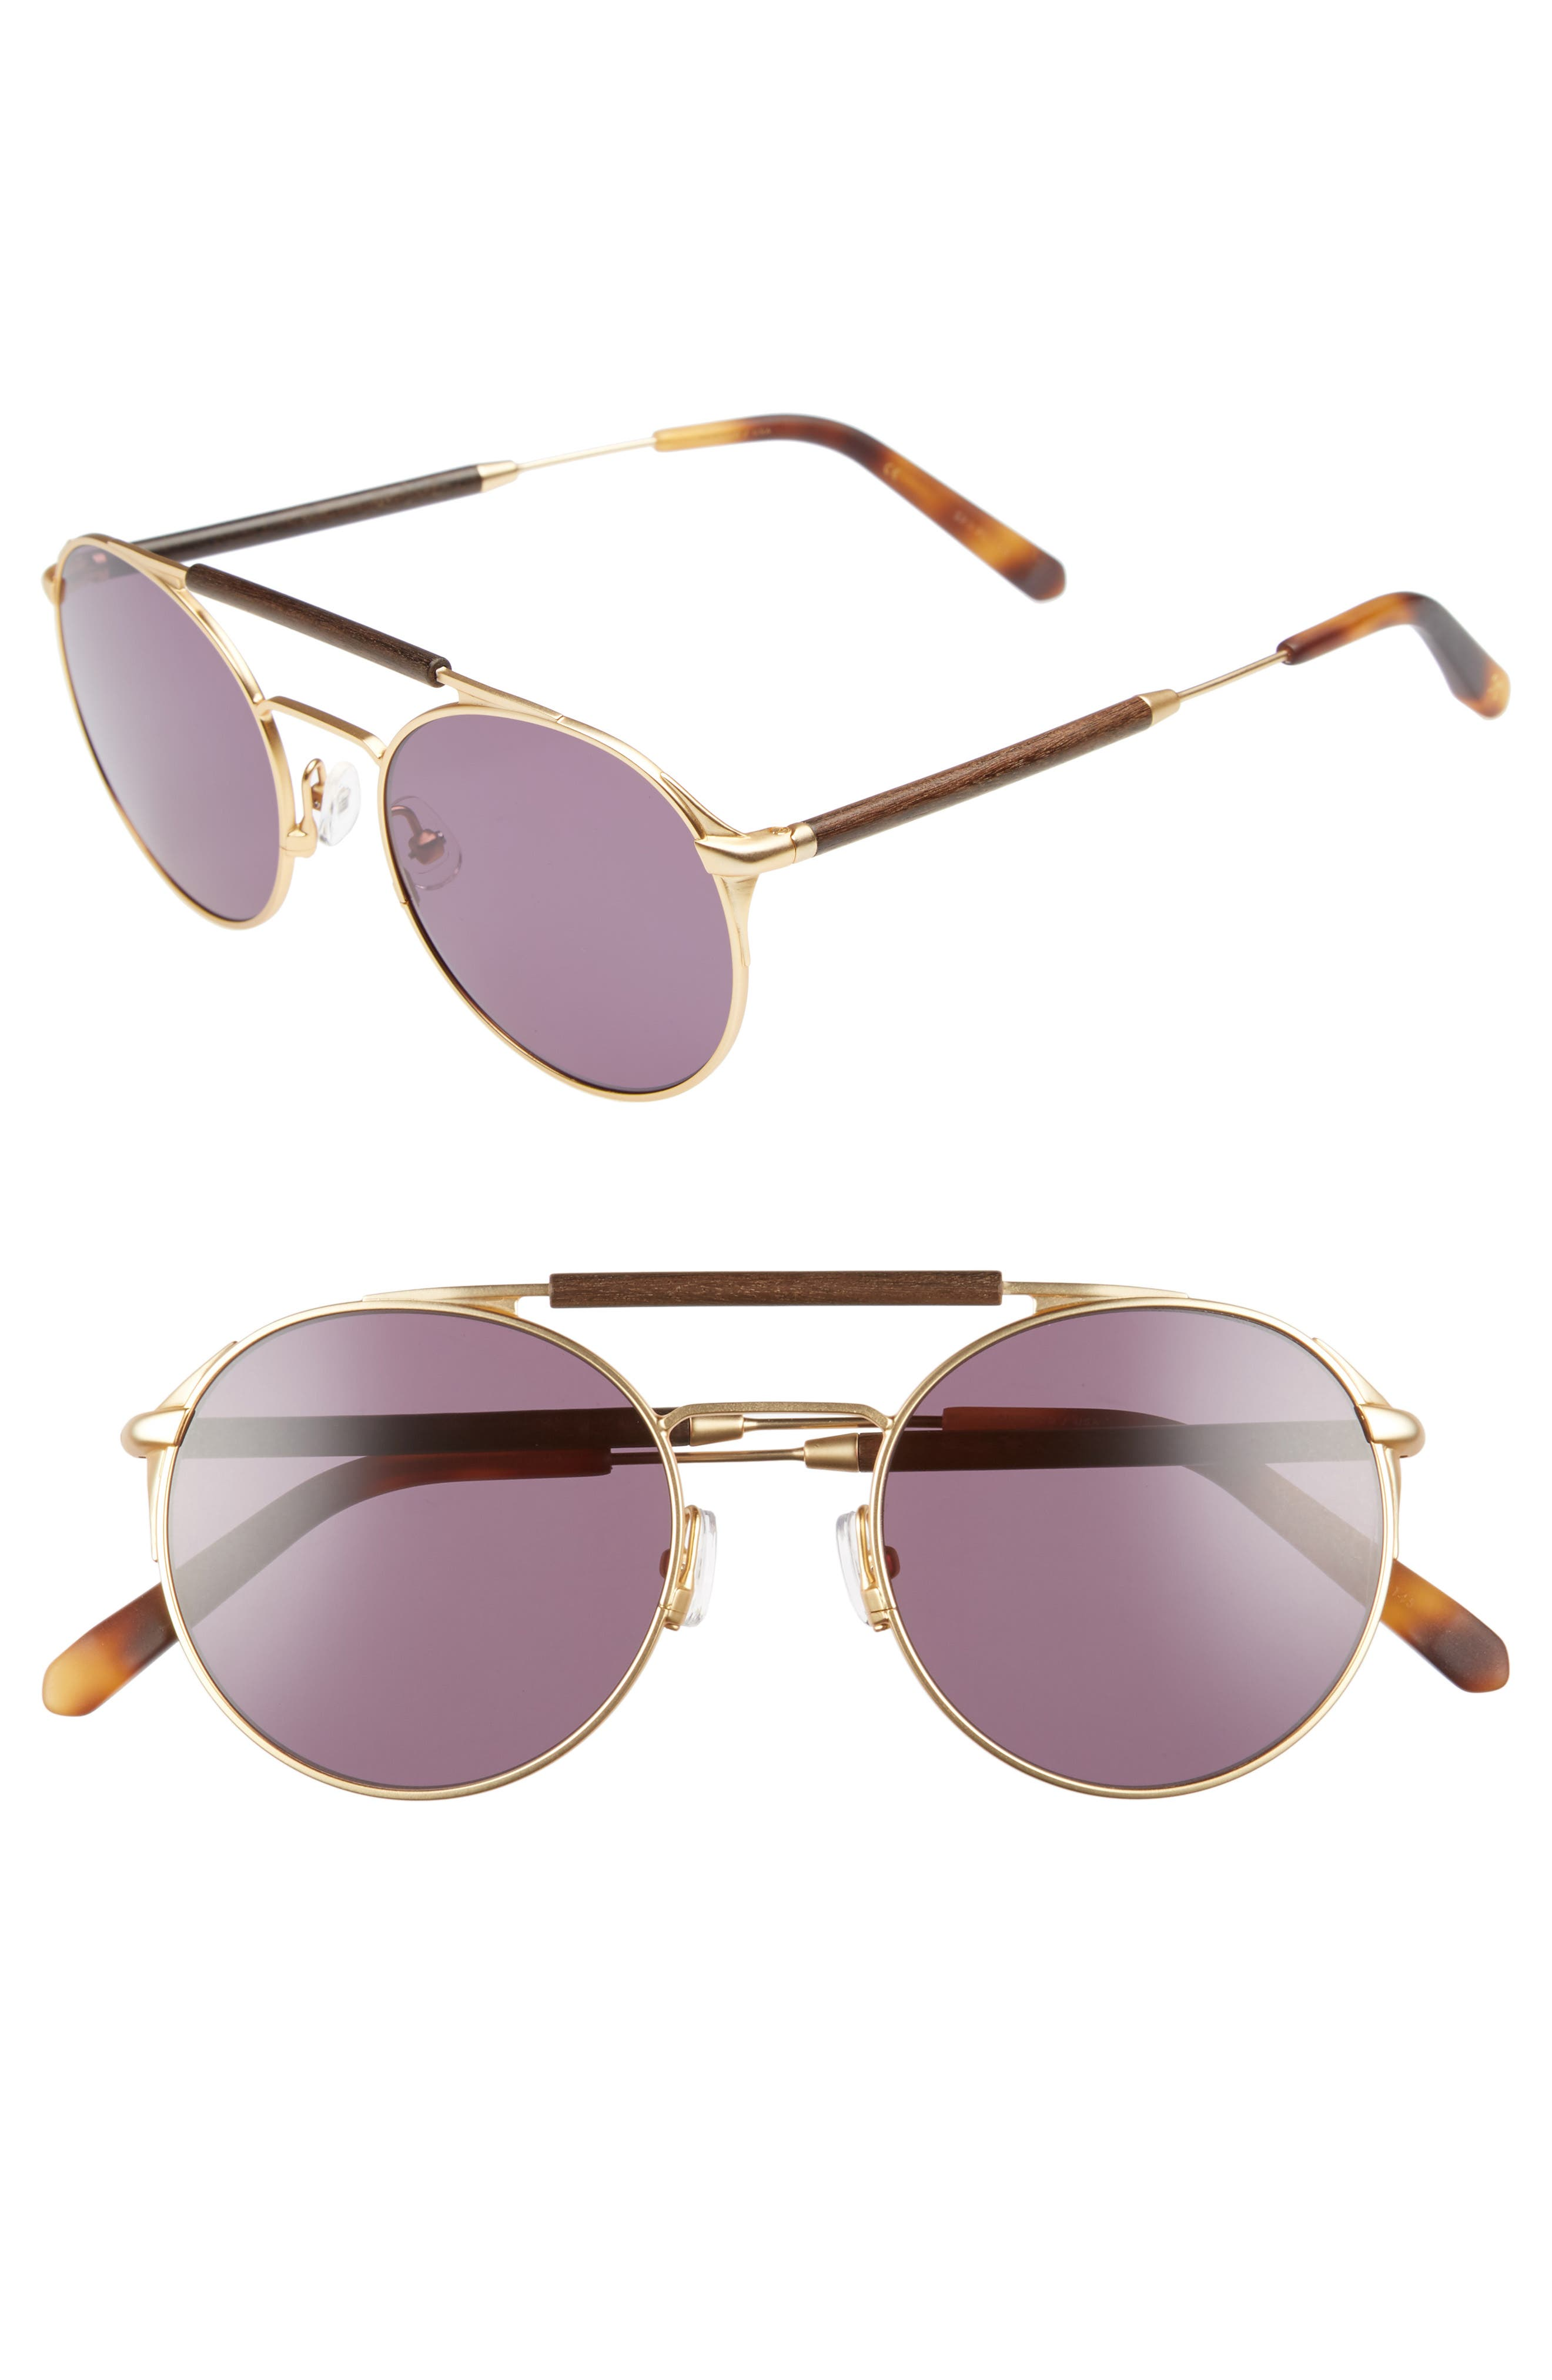 Bandon 52mm Round Sunglasses,                             Main thumbnail 1, color,                             Matte Gold/ Walnut/ Grey